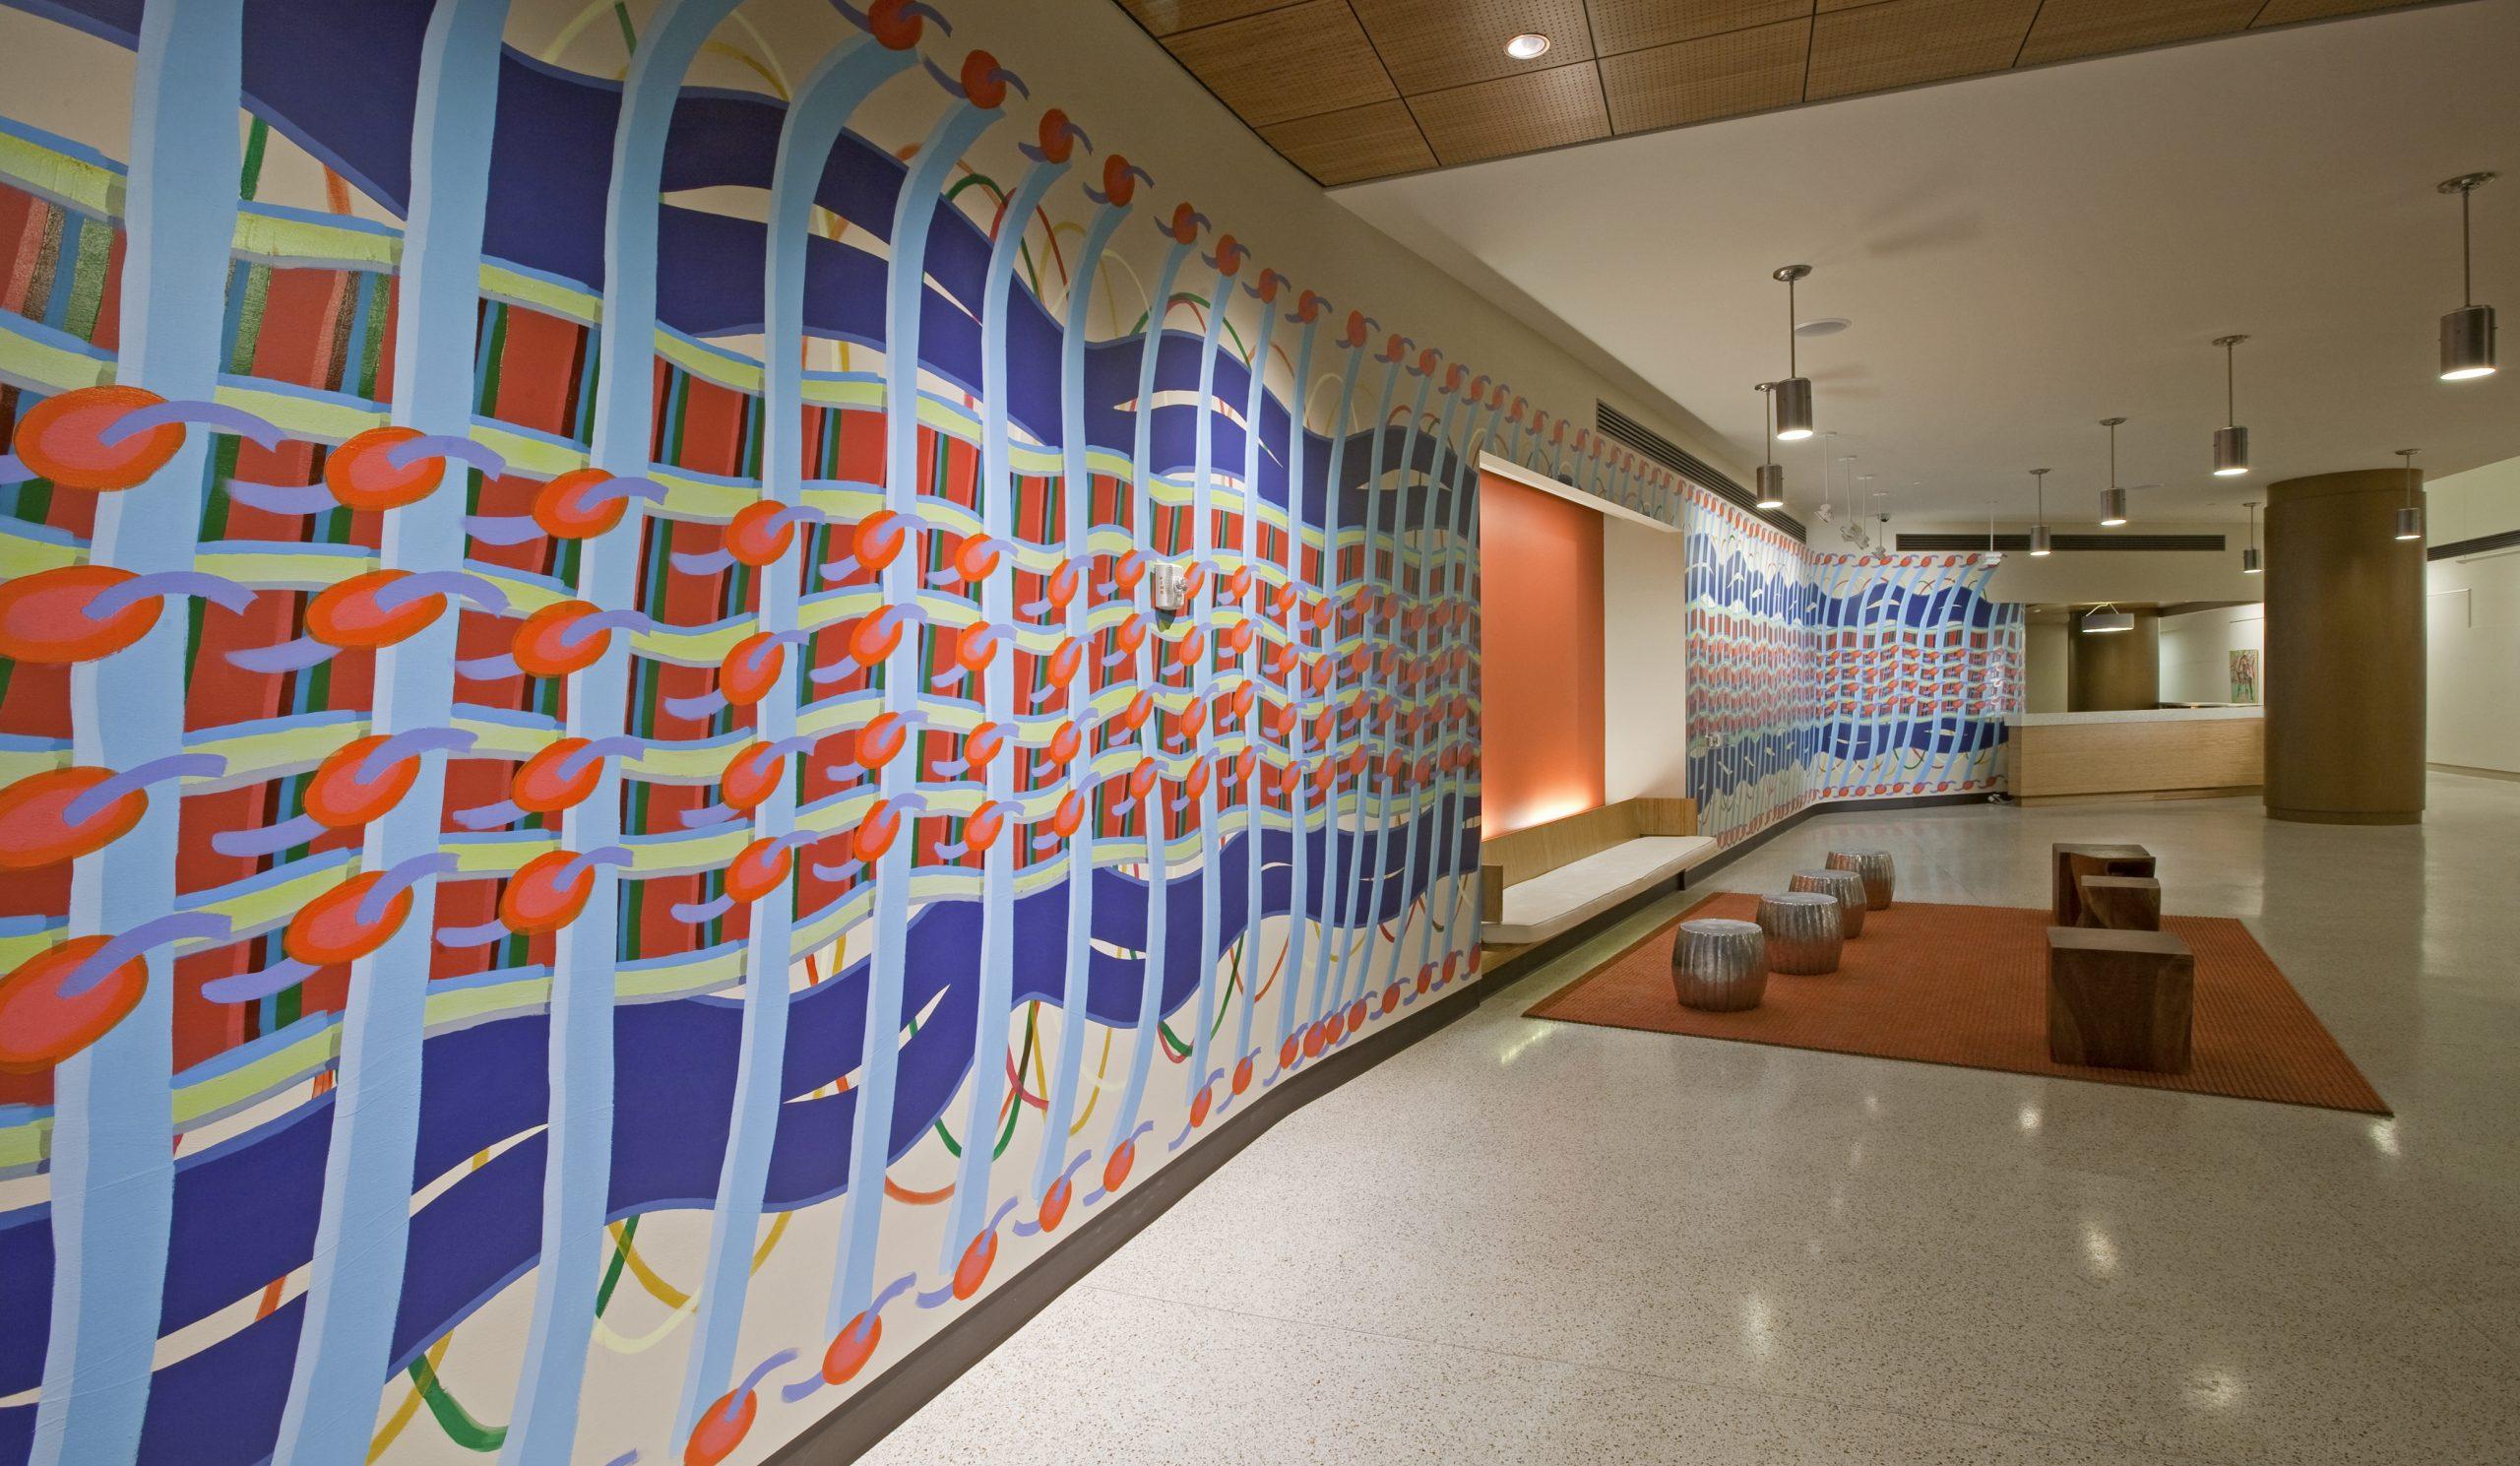 Loop Weave Woven Wall Painting